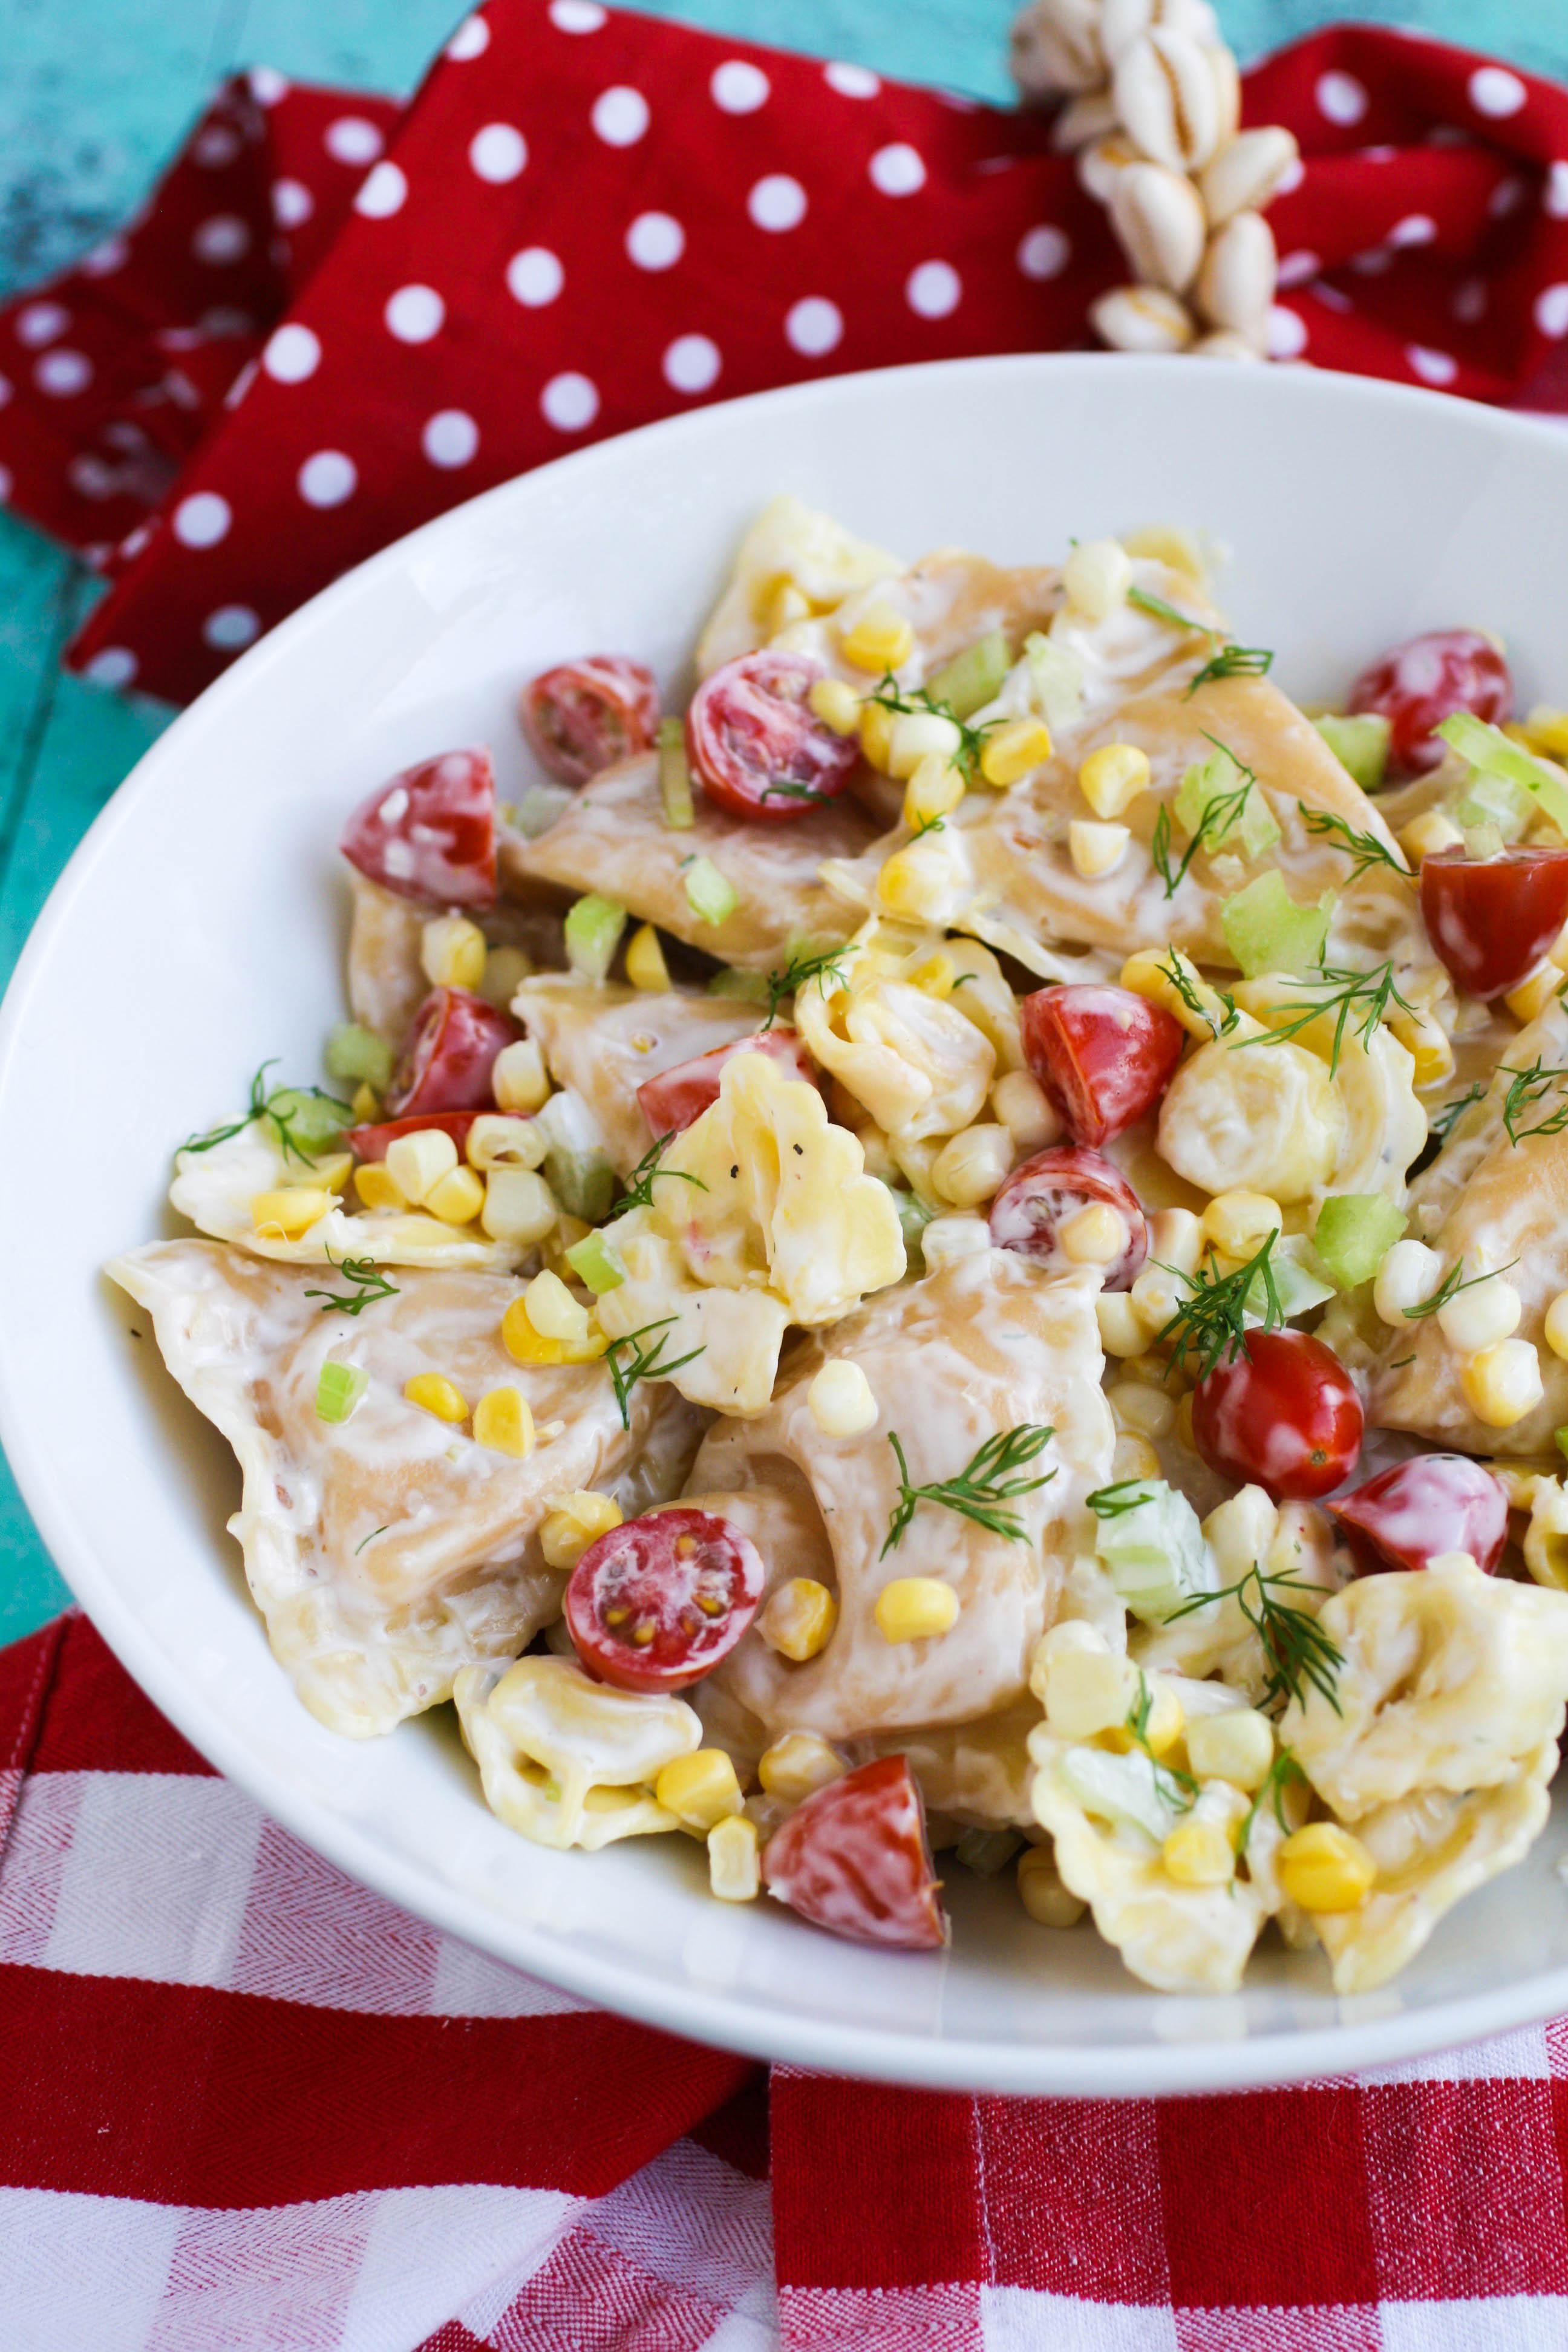 You'll adore this Lobster Ravioli Pasta Salad with Creamy Lemon Dressing. Make Lobster Ravioli Pasta Salad with Creamy Lemon Dressing for your next summer gathering.